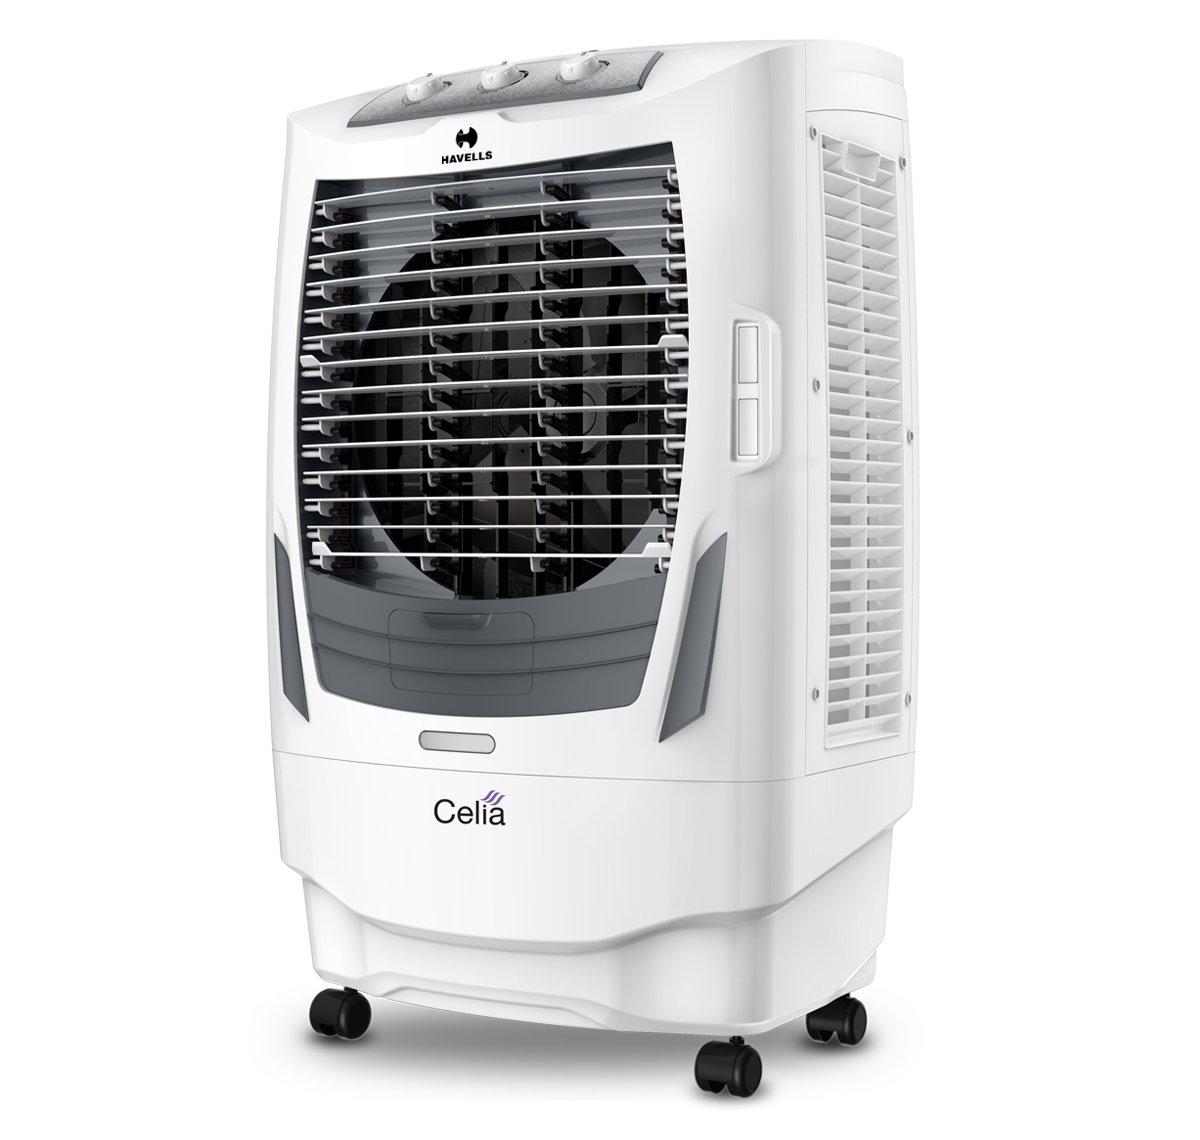 Havells Celia Desert Air Cooler Image